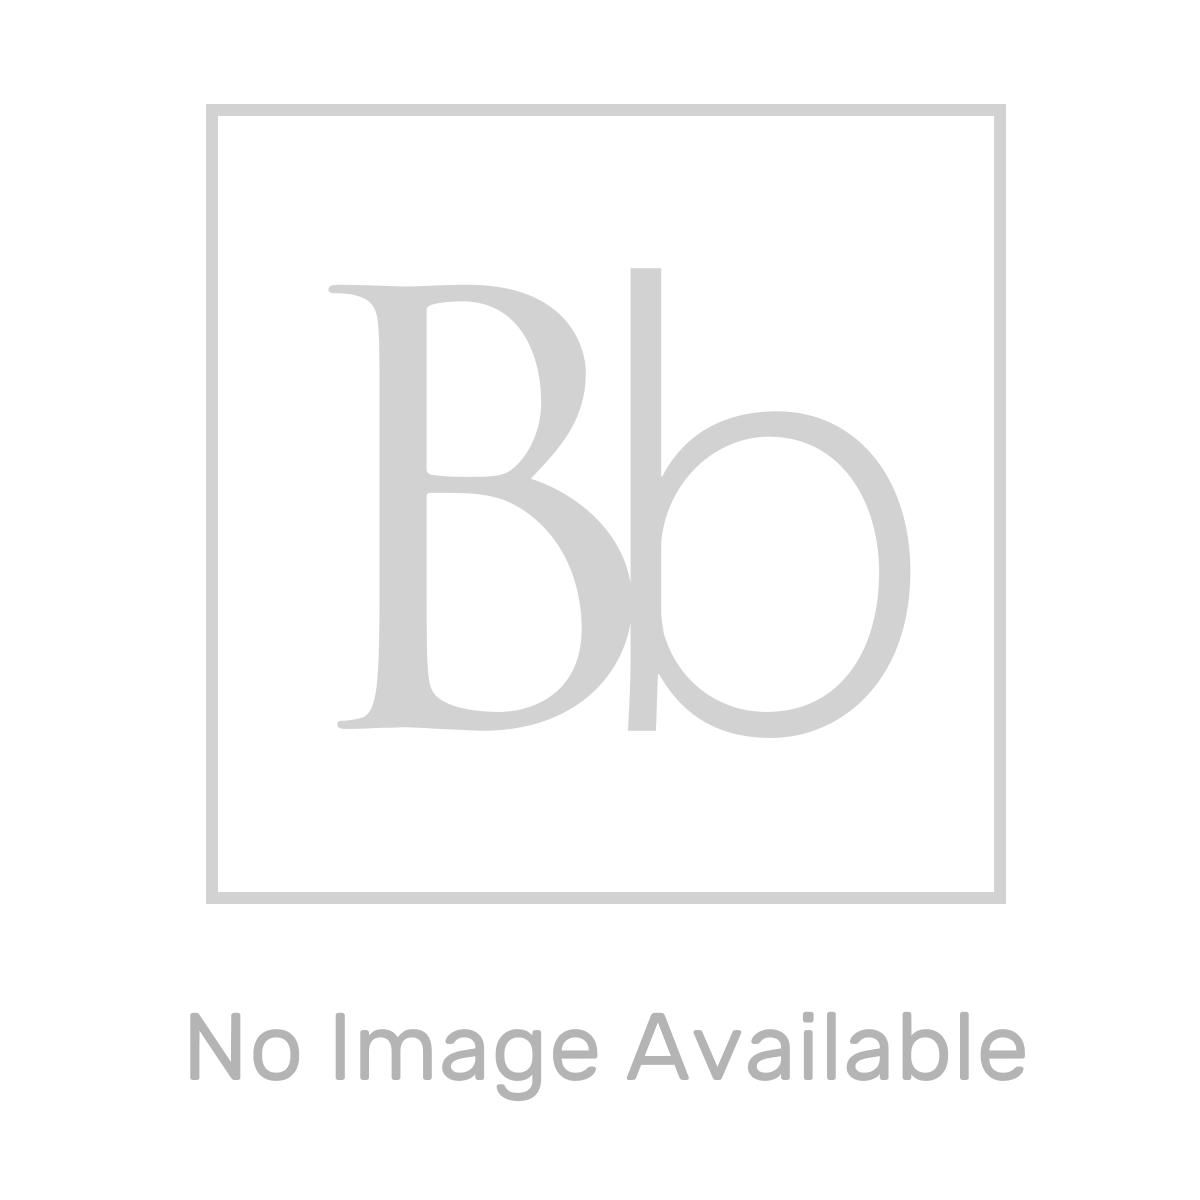 BTL Vema Thermostatic Matt Black Shower Column with Fixed Head and Riser